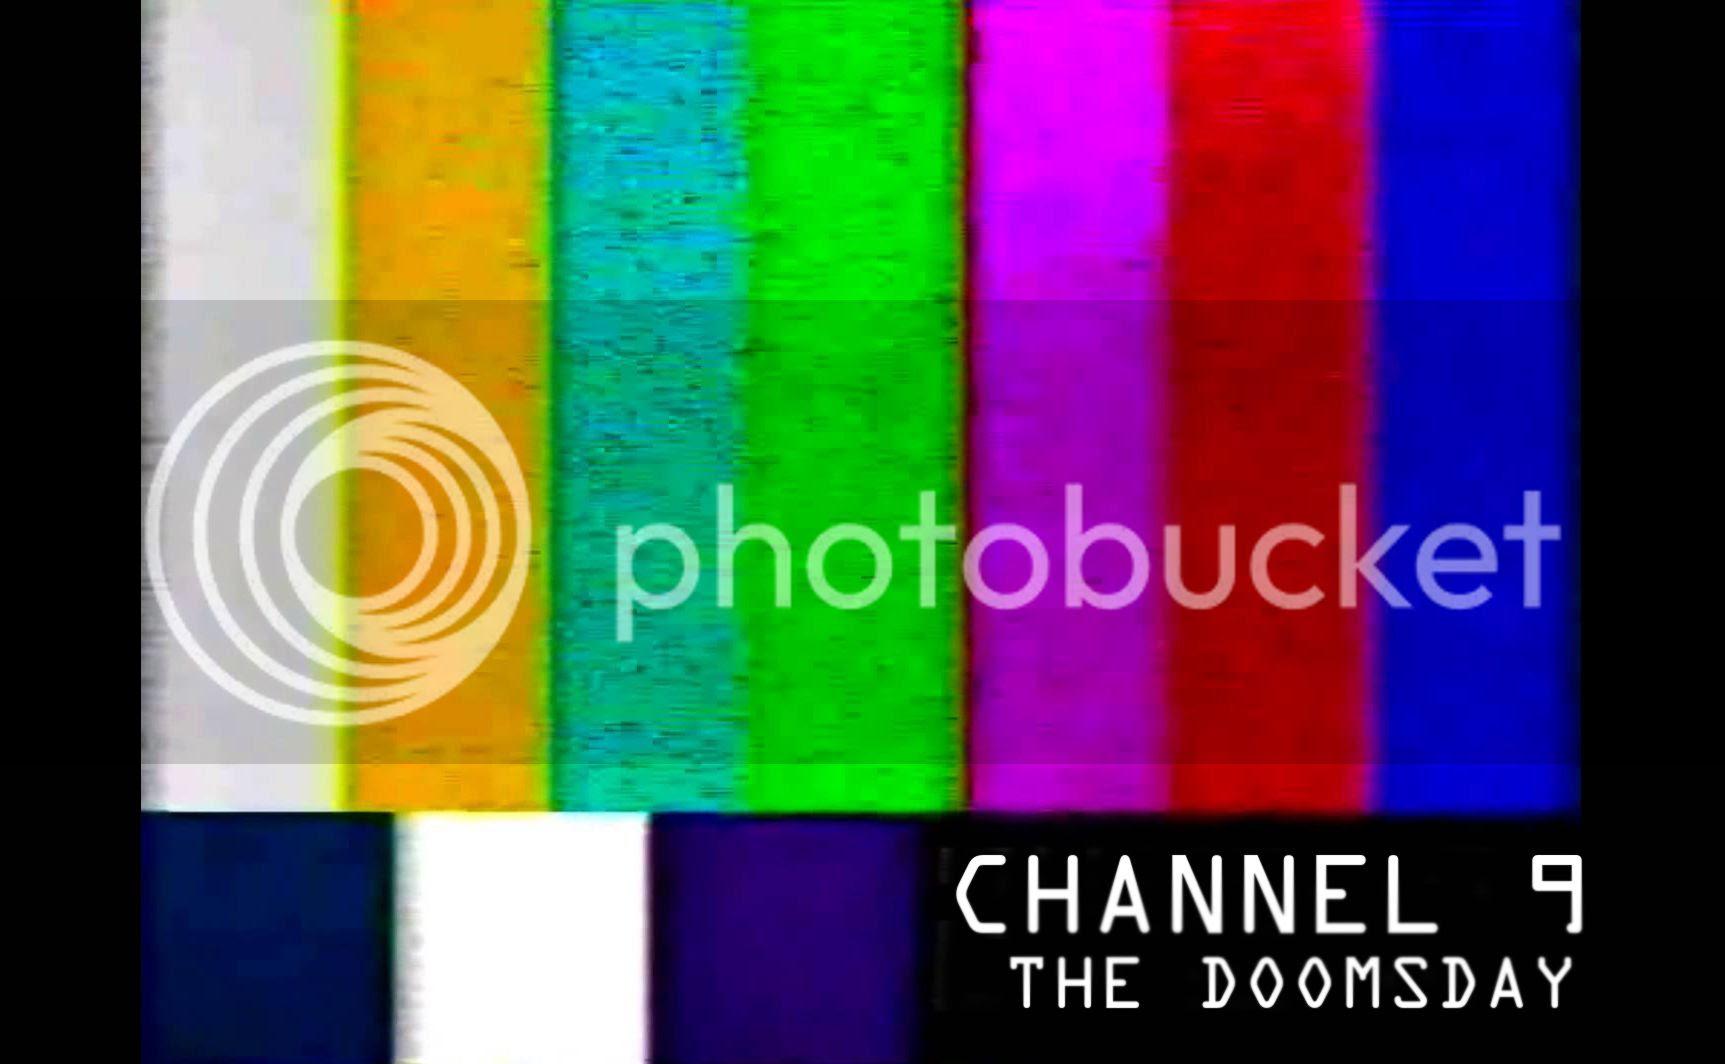 photo TVMonthChannel9_zps8udmyv7p.jpg